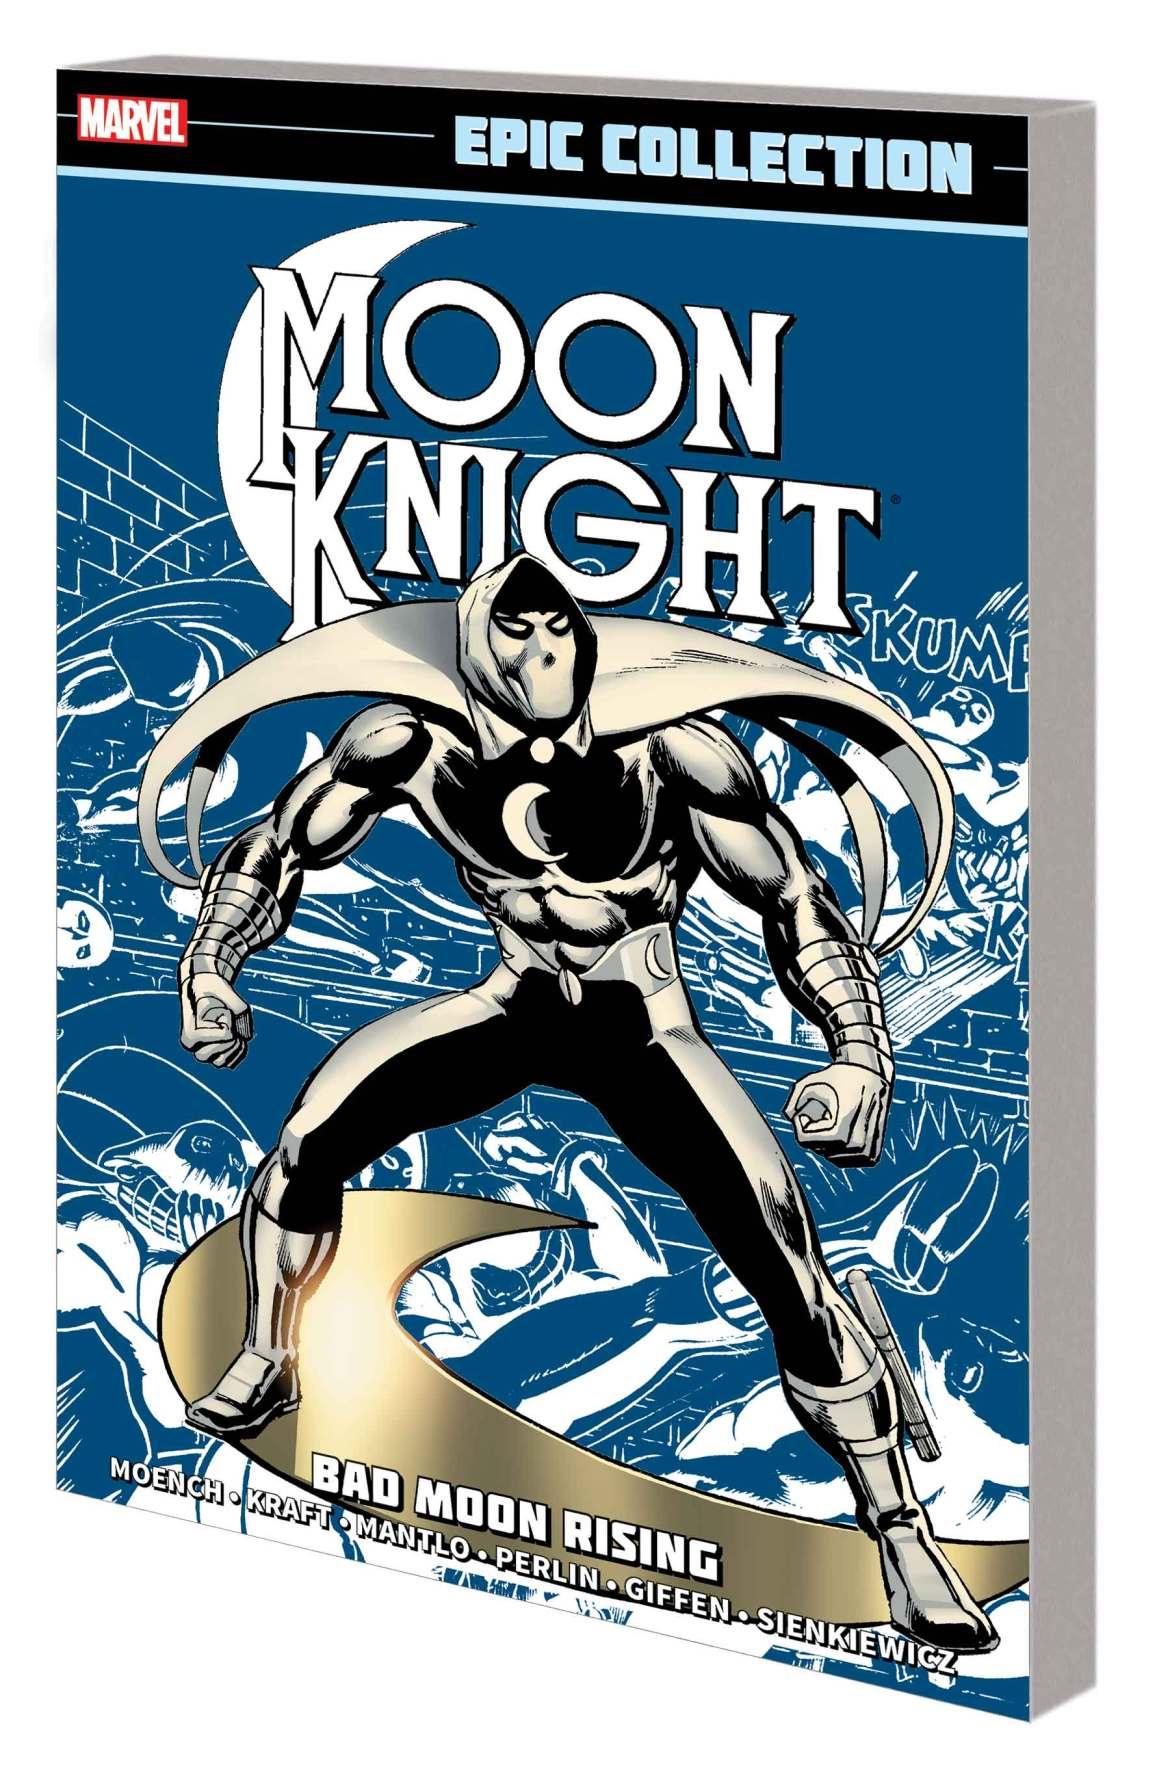 MOONKNEPICV01TPB_cover Marvel Comics May 2021 Solicitations